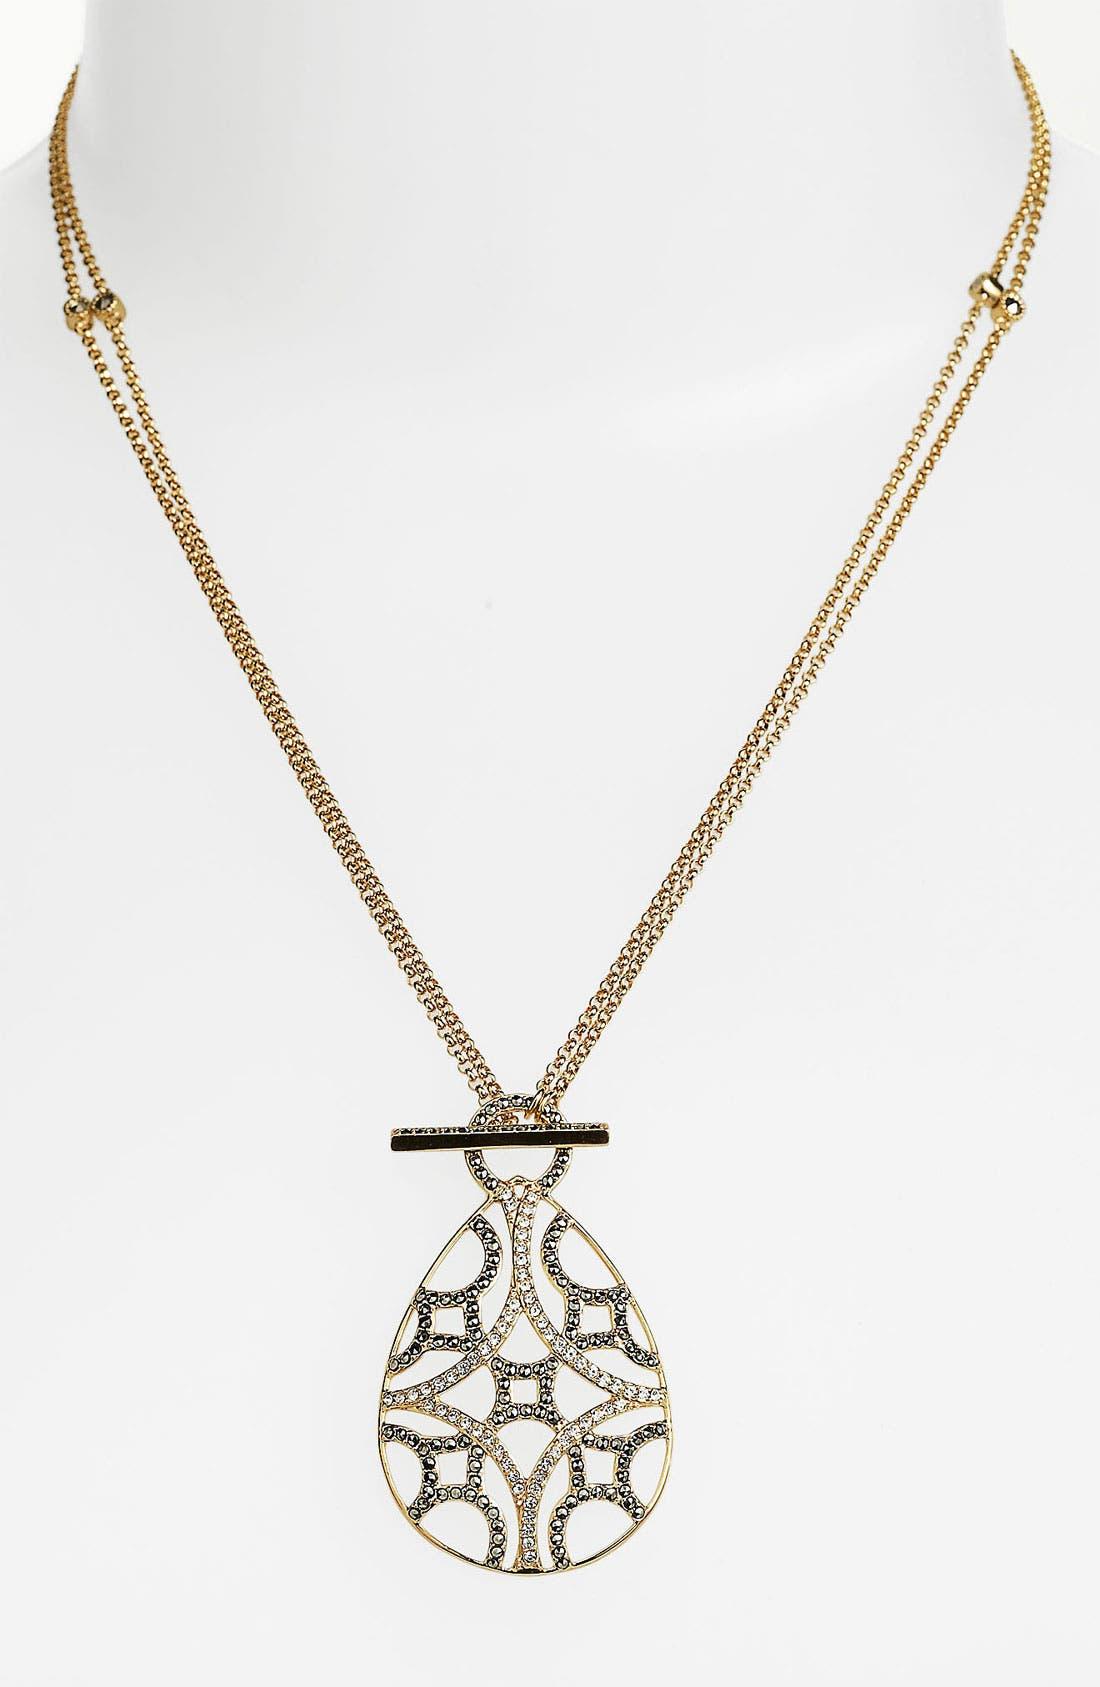 Main Image - Judith Jack 'Matrix' Convertible Pendant Necklace